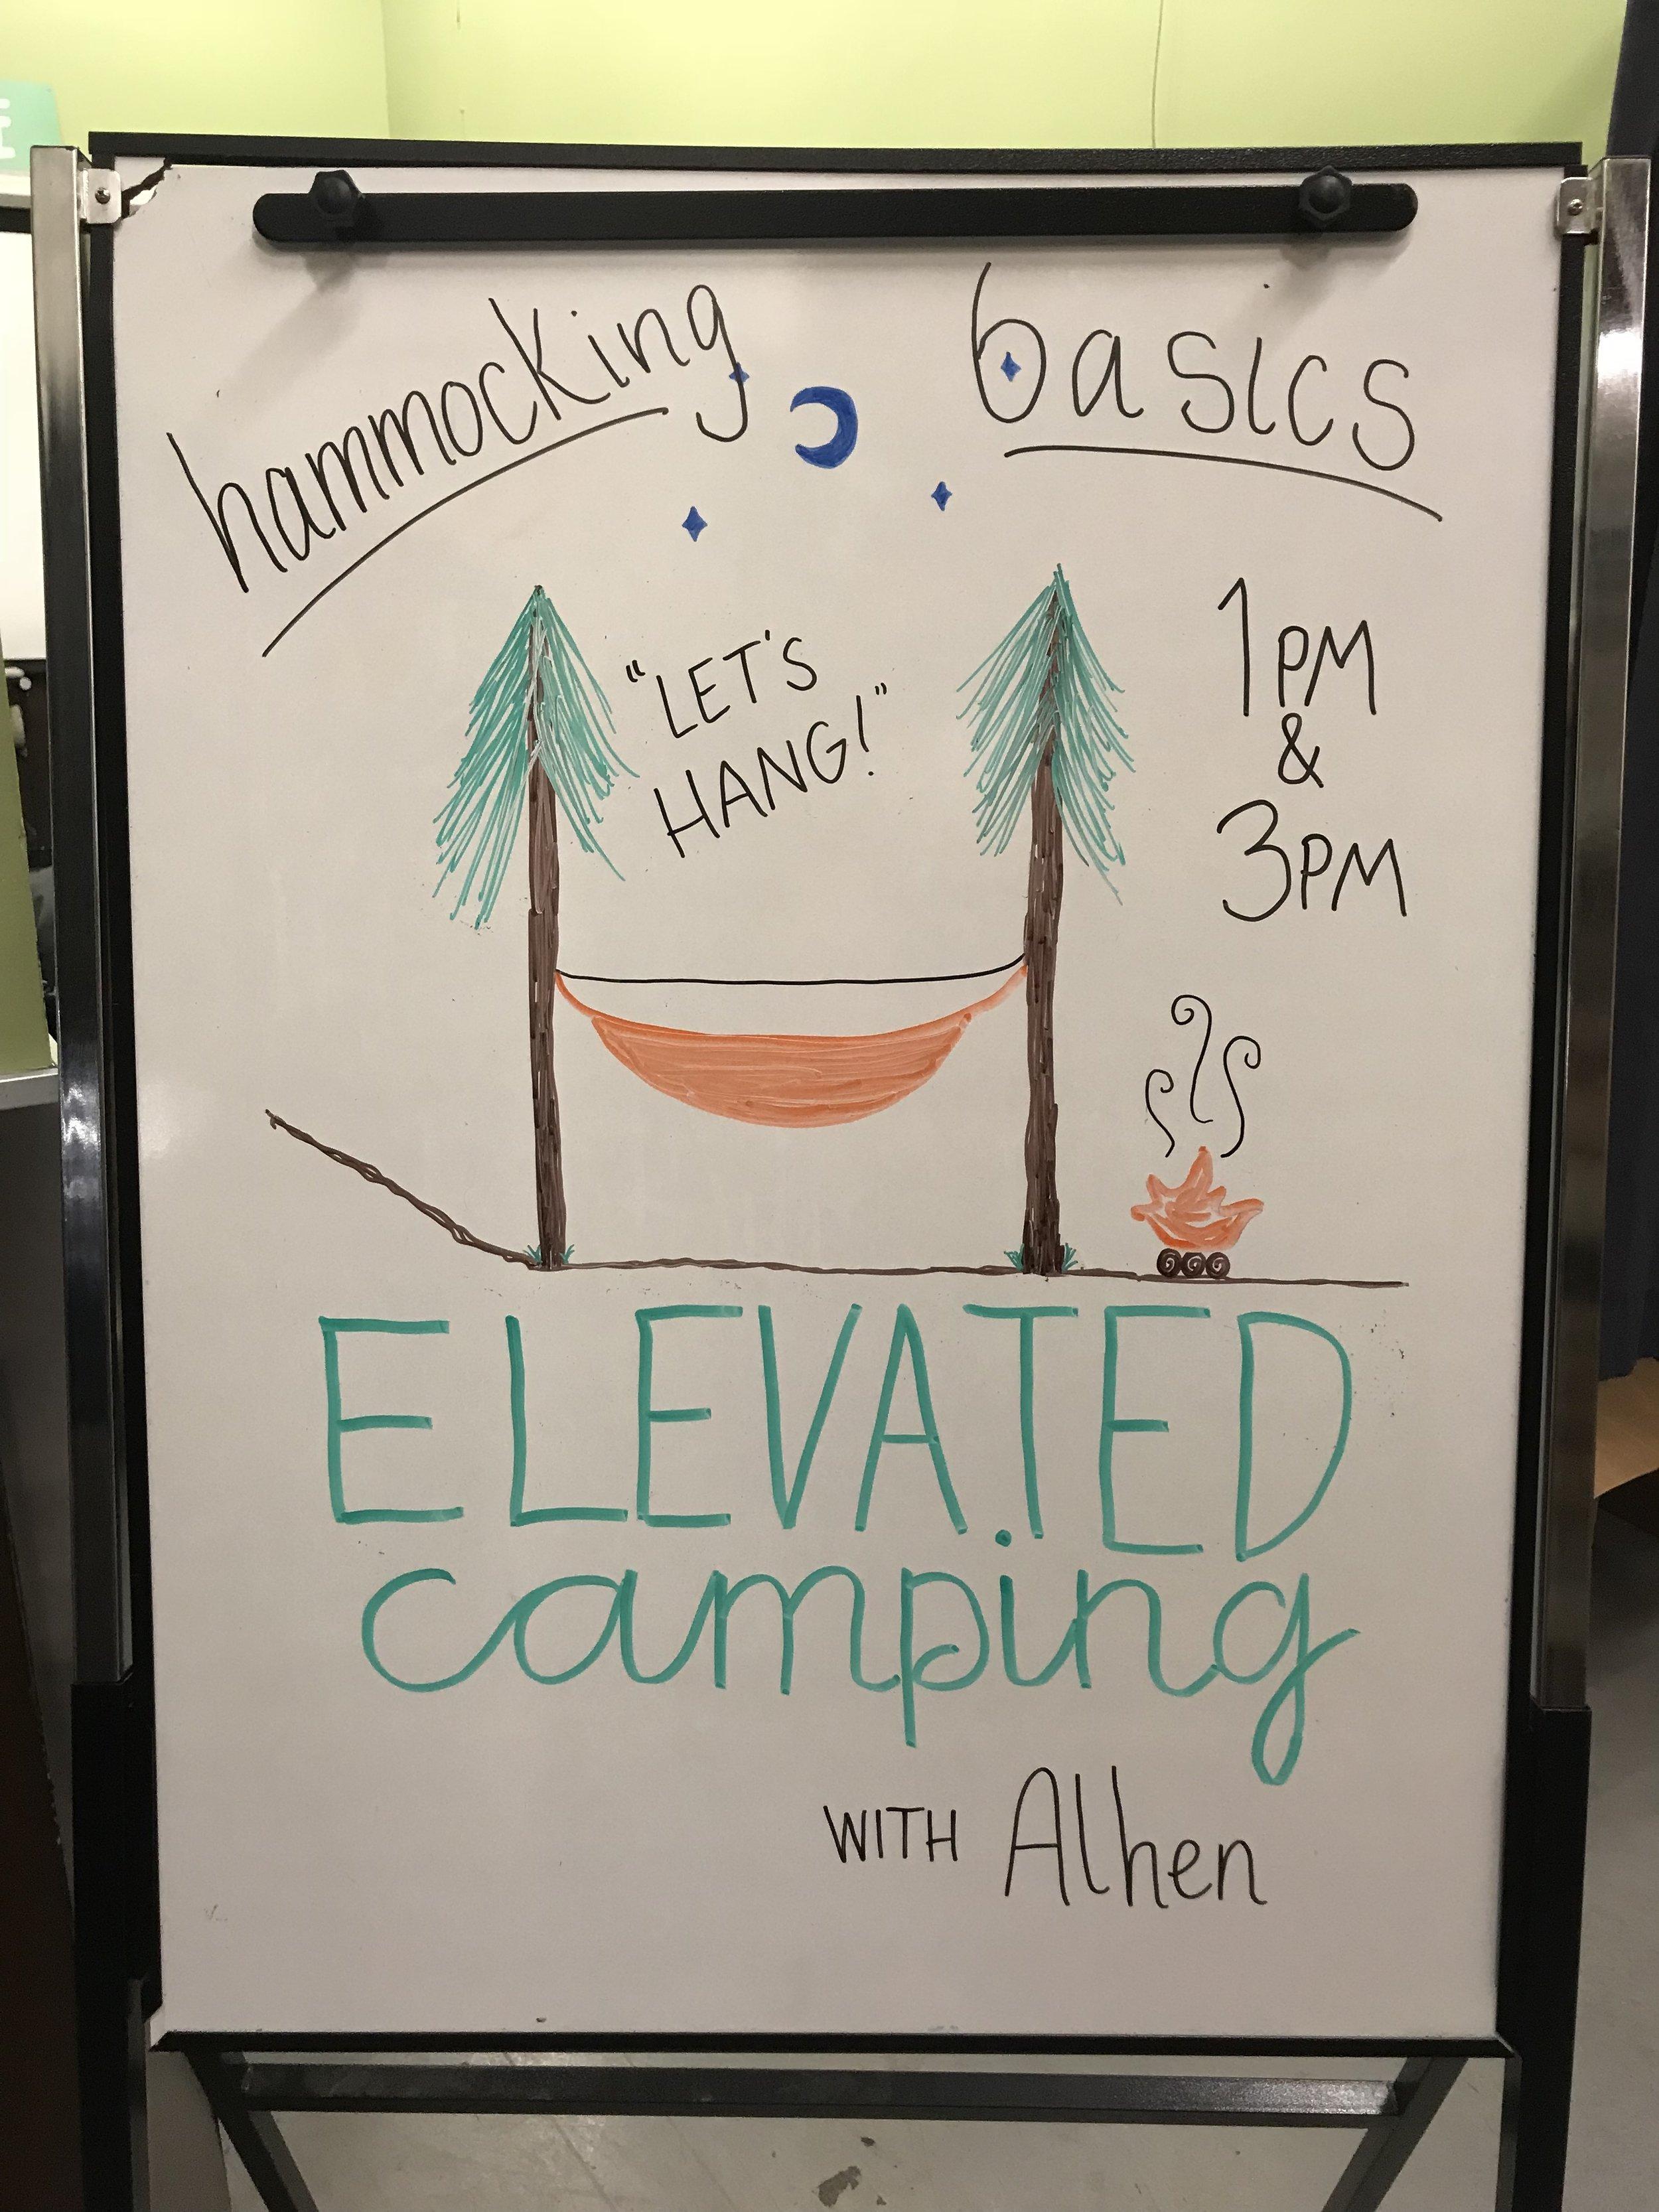 And he began teaching hammock camping workshops!